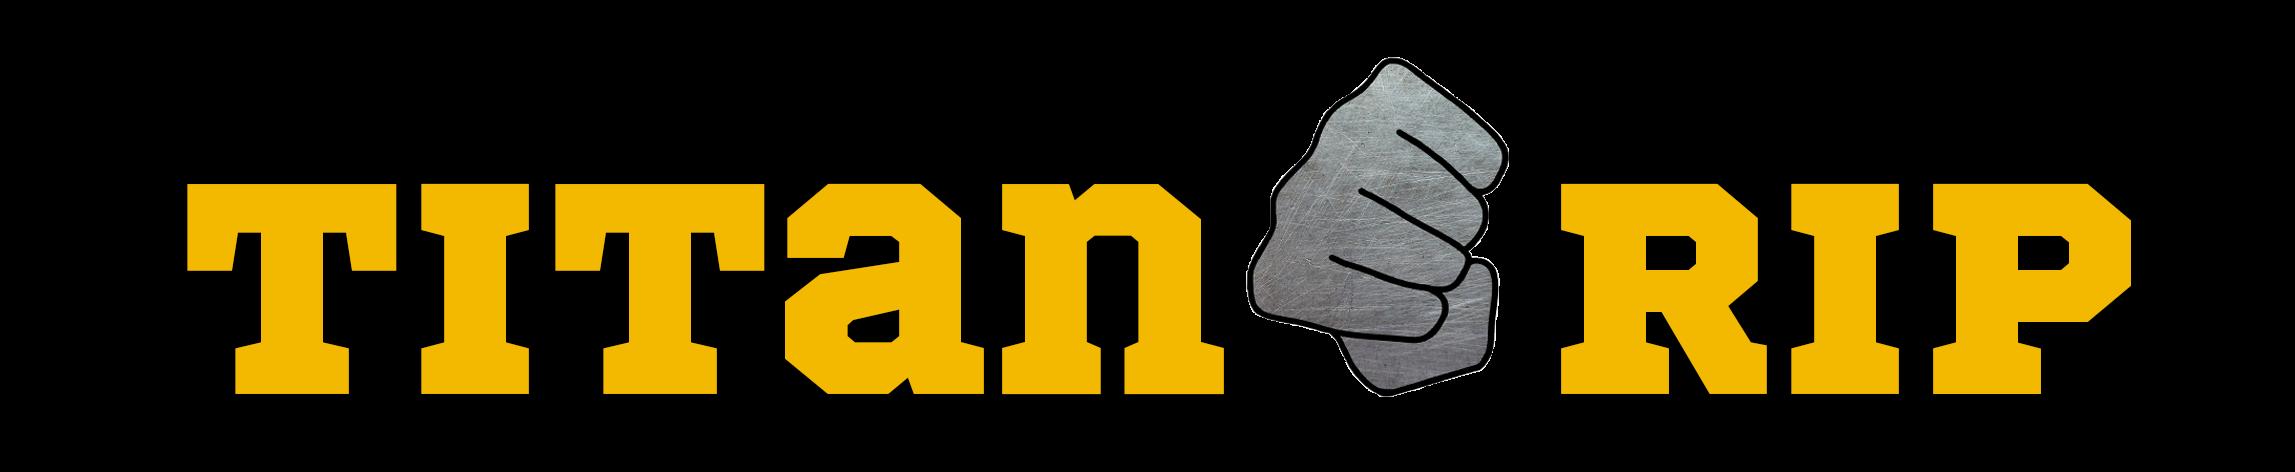 Titangrip